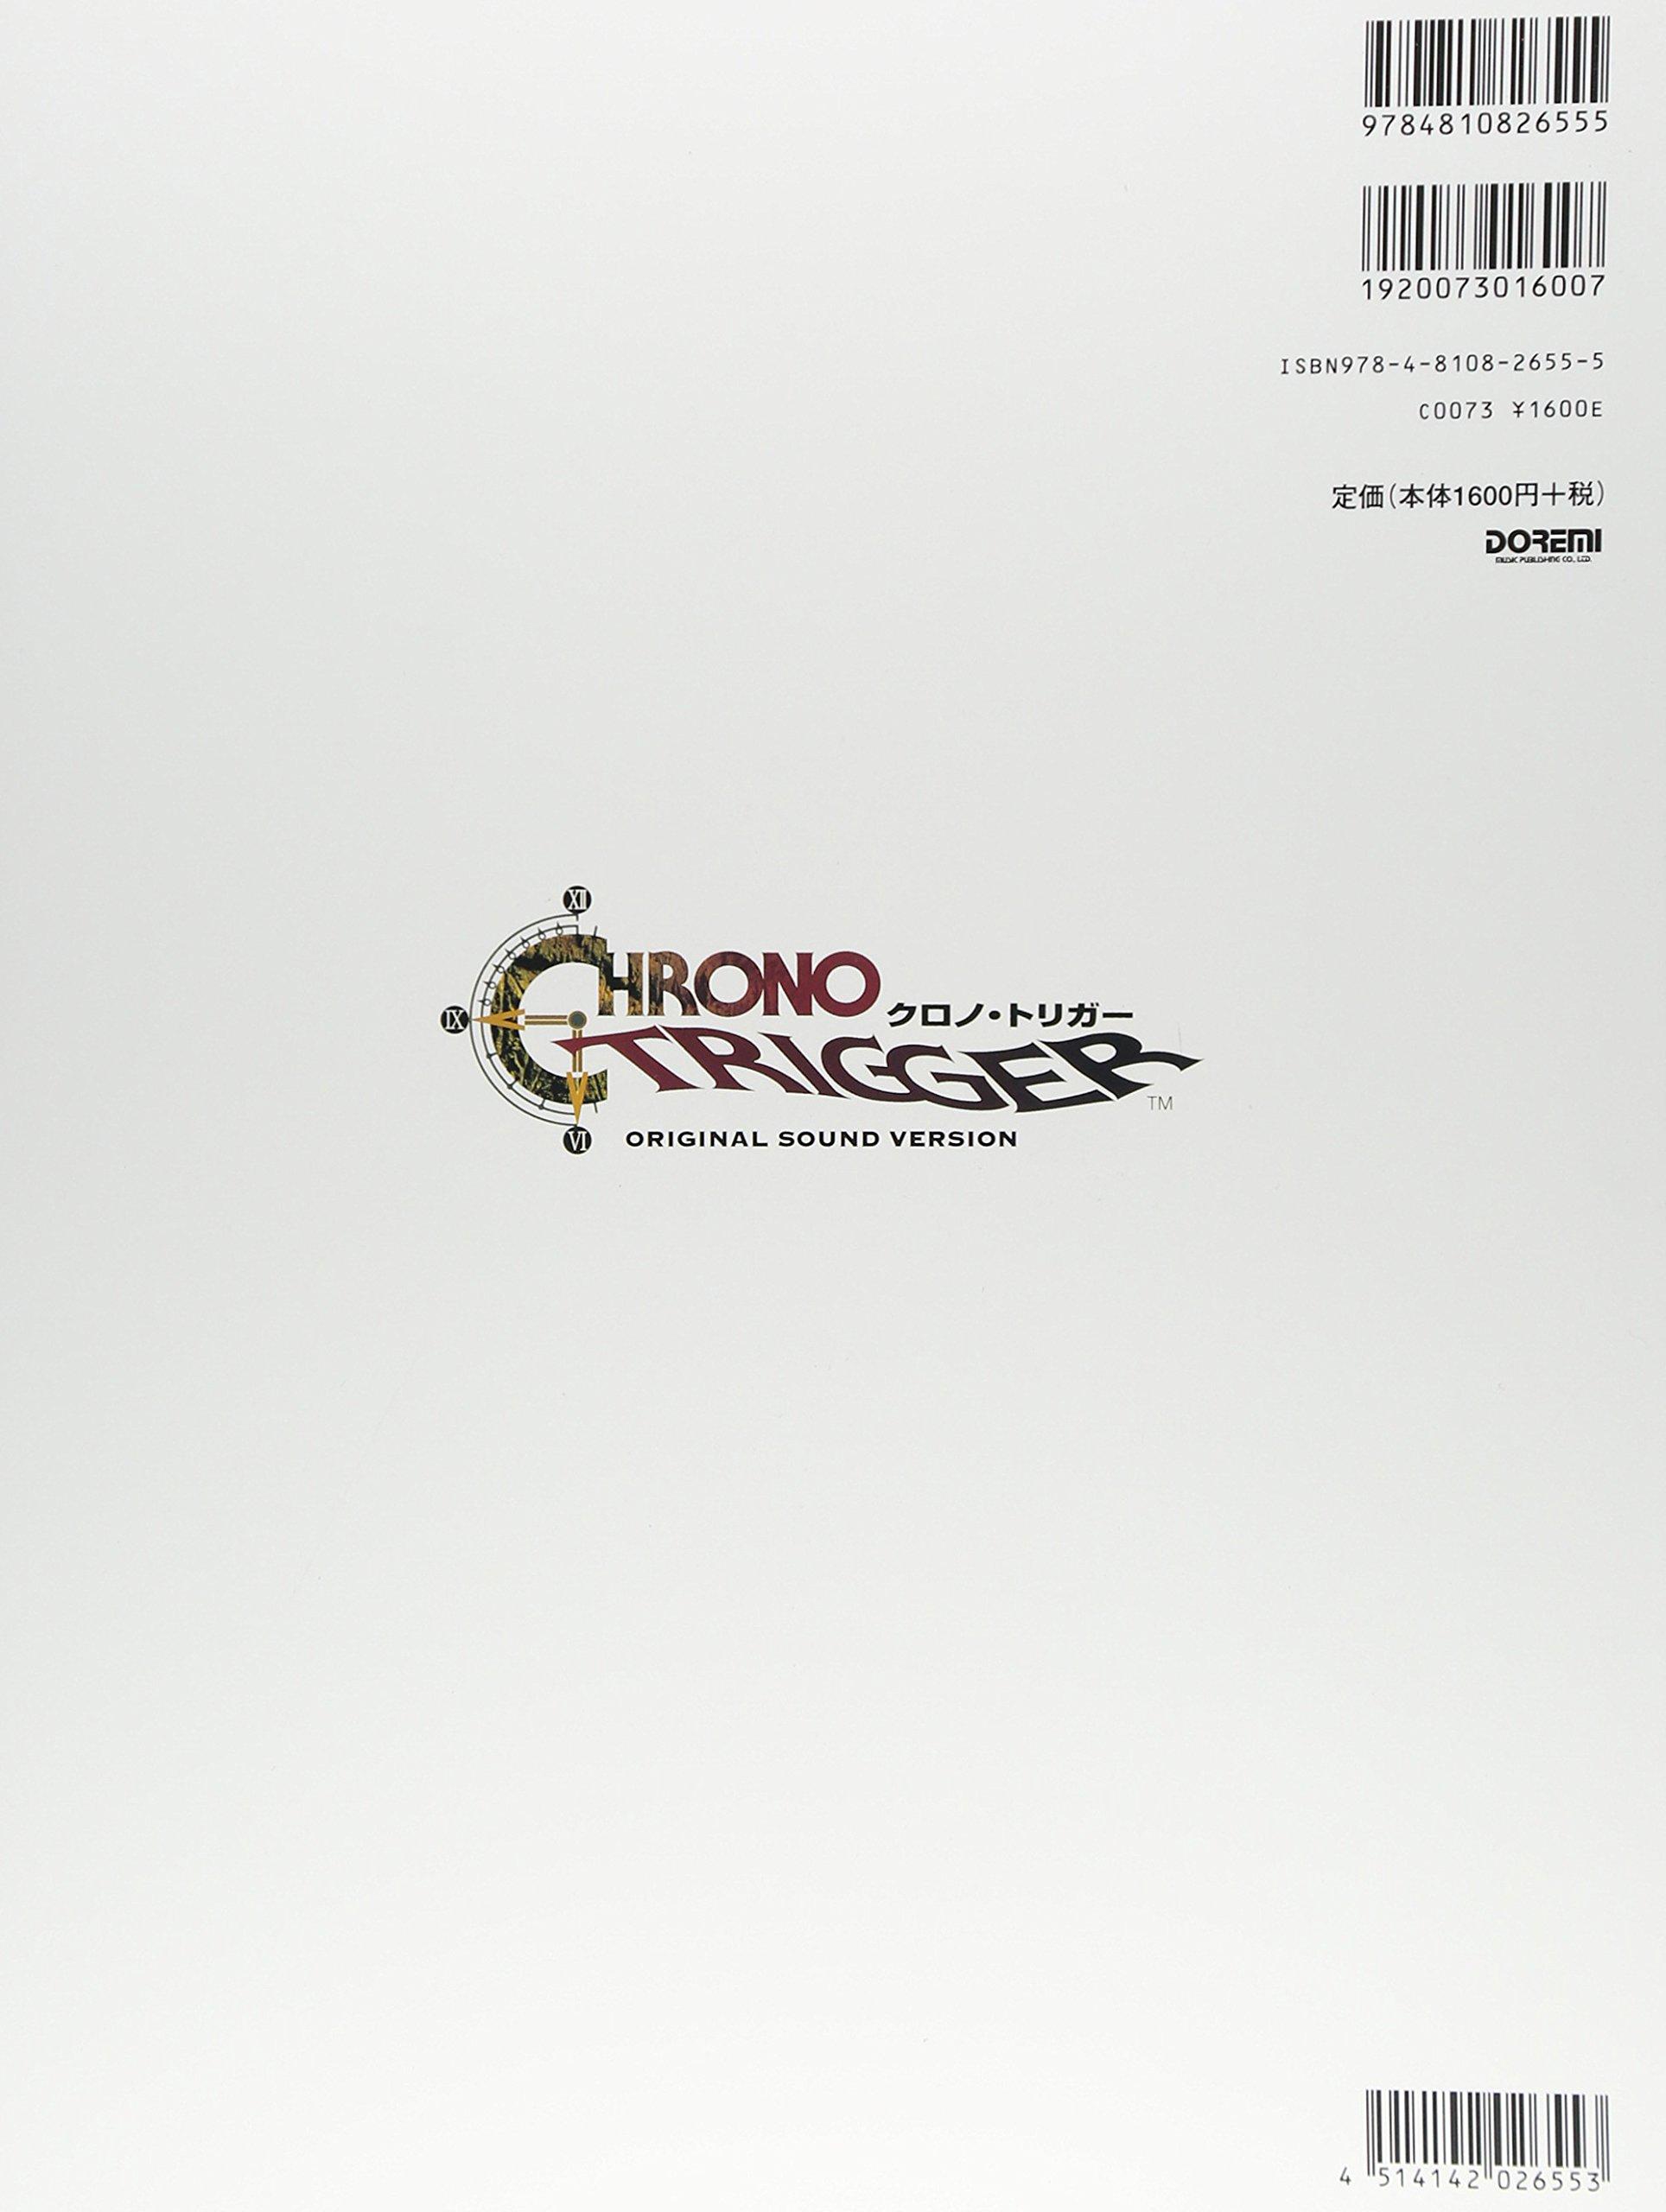 Chrono Trigger Original Sound Version Piano Score Japanese GAME MUSIC BOOK